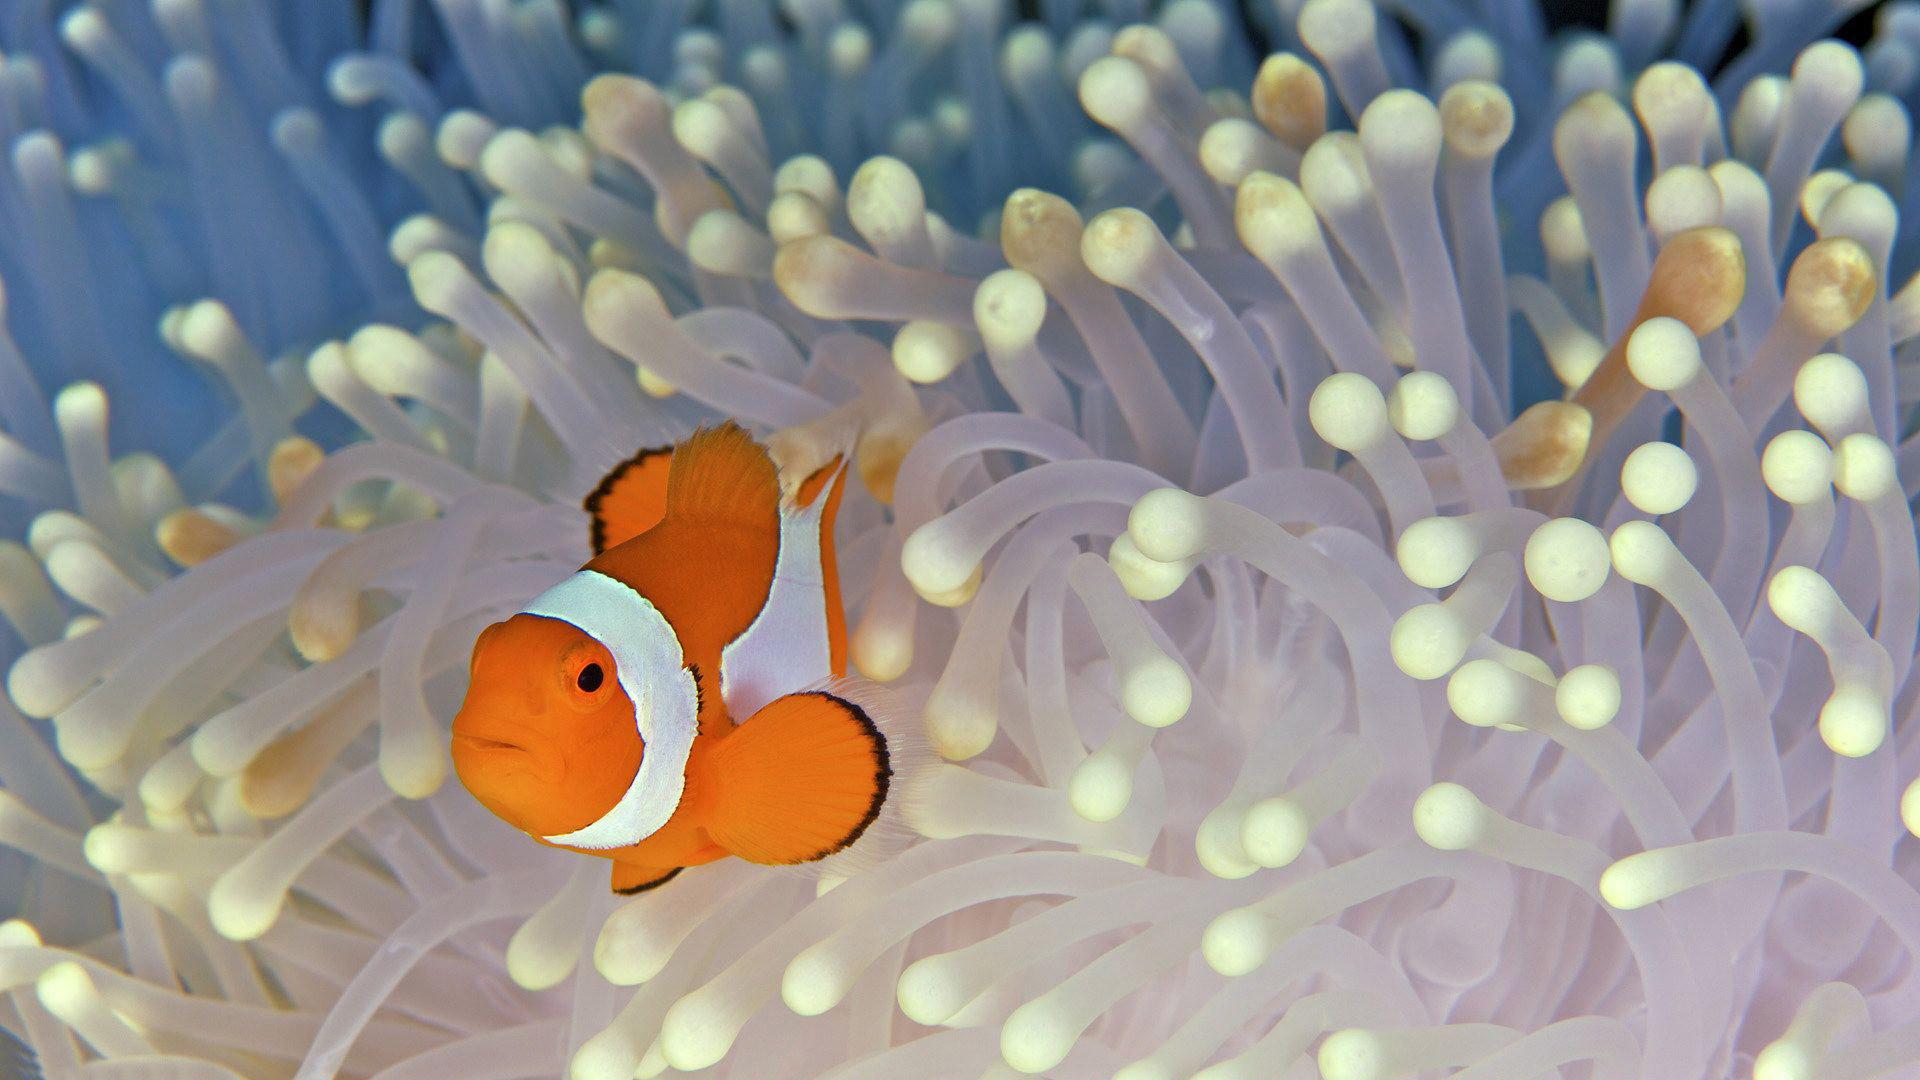 Clown Fish Wallpaper Iphone 6 Plus Clown Fish Wallpaper 61 Pictures